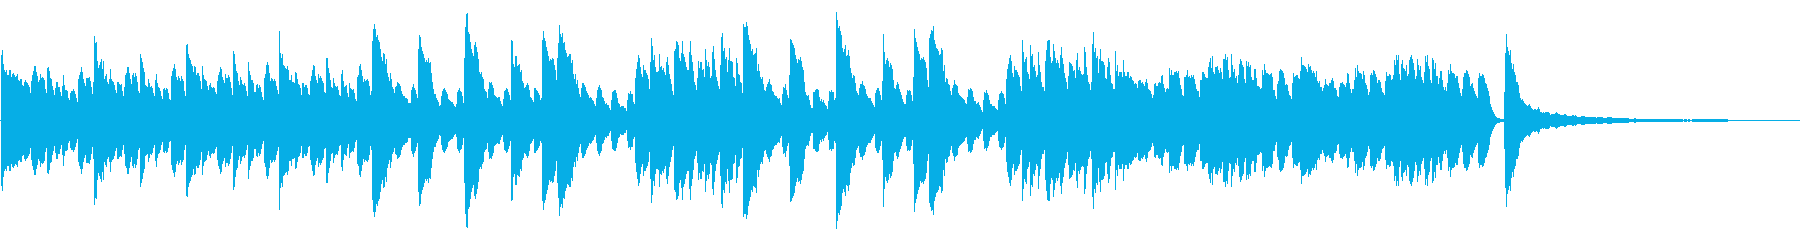 SNS広告 ピアノメイン きれいの再生済みの波形